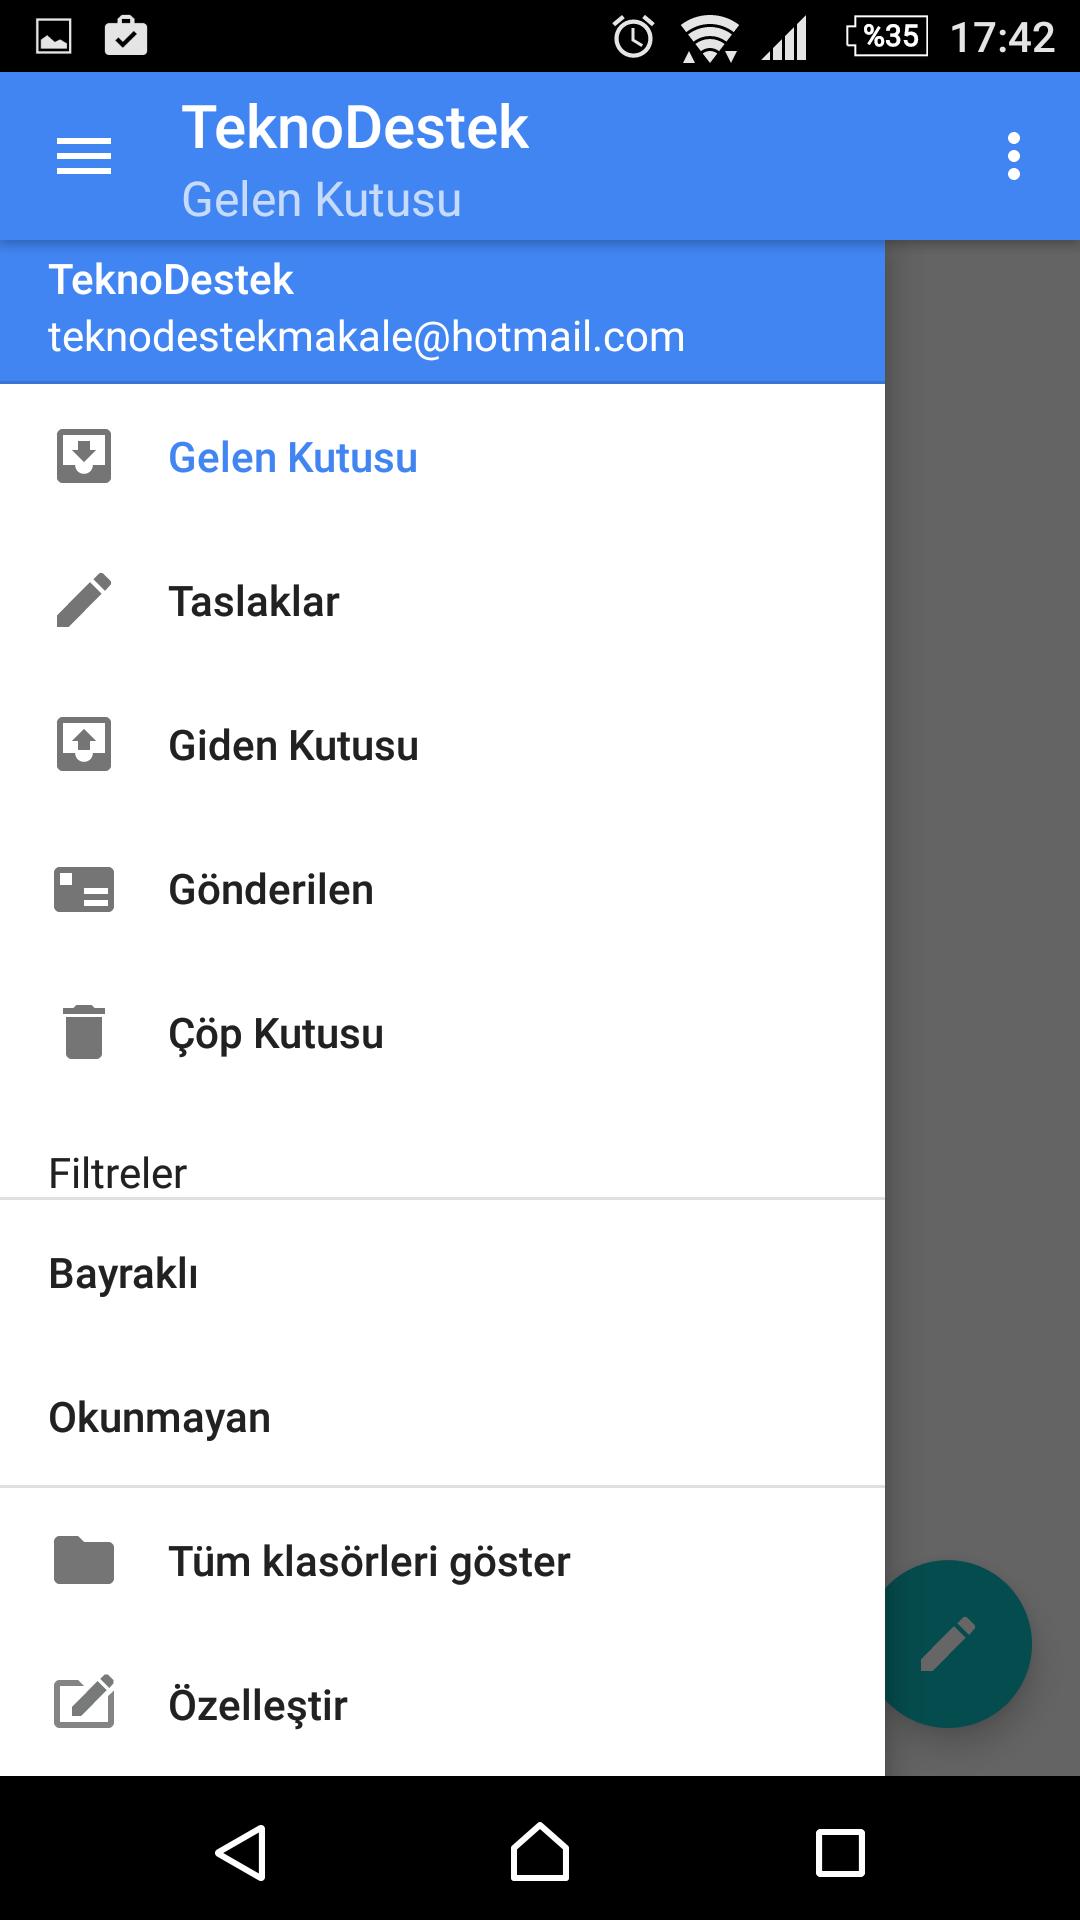 screenshot_20161118-174259